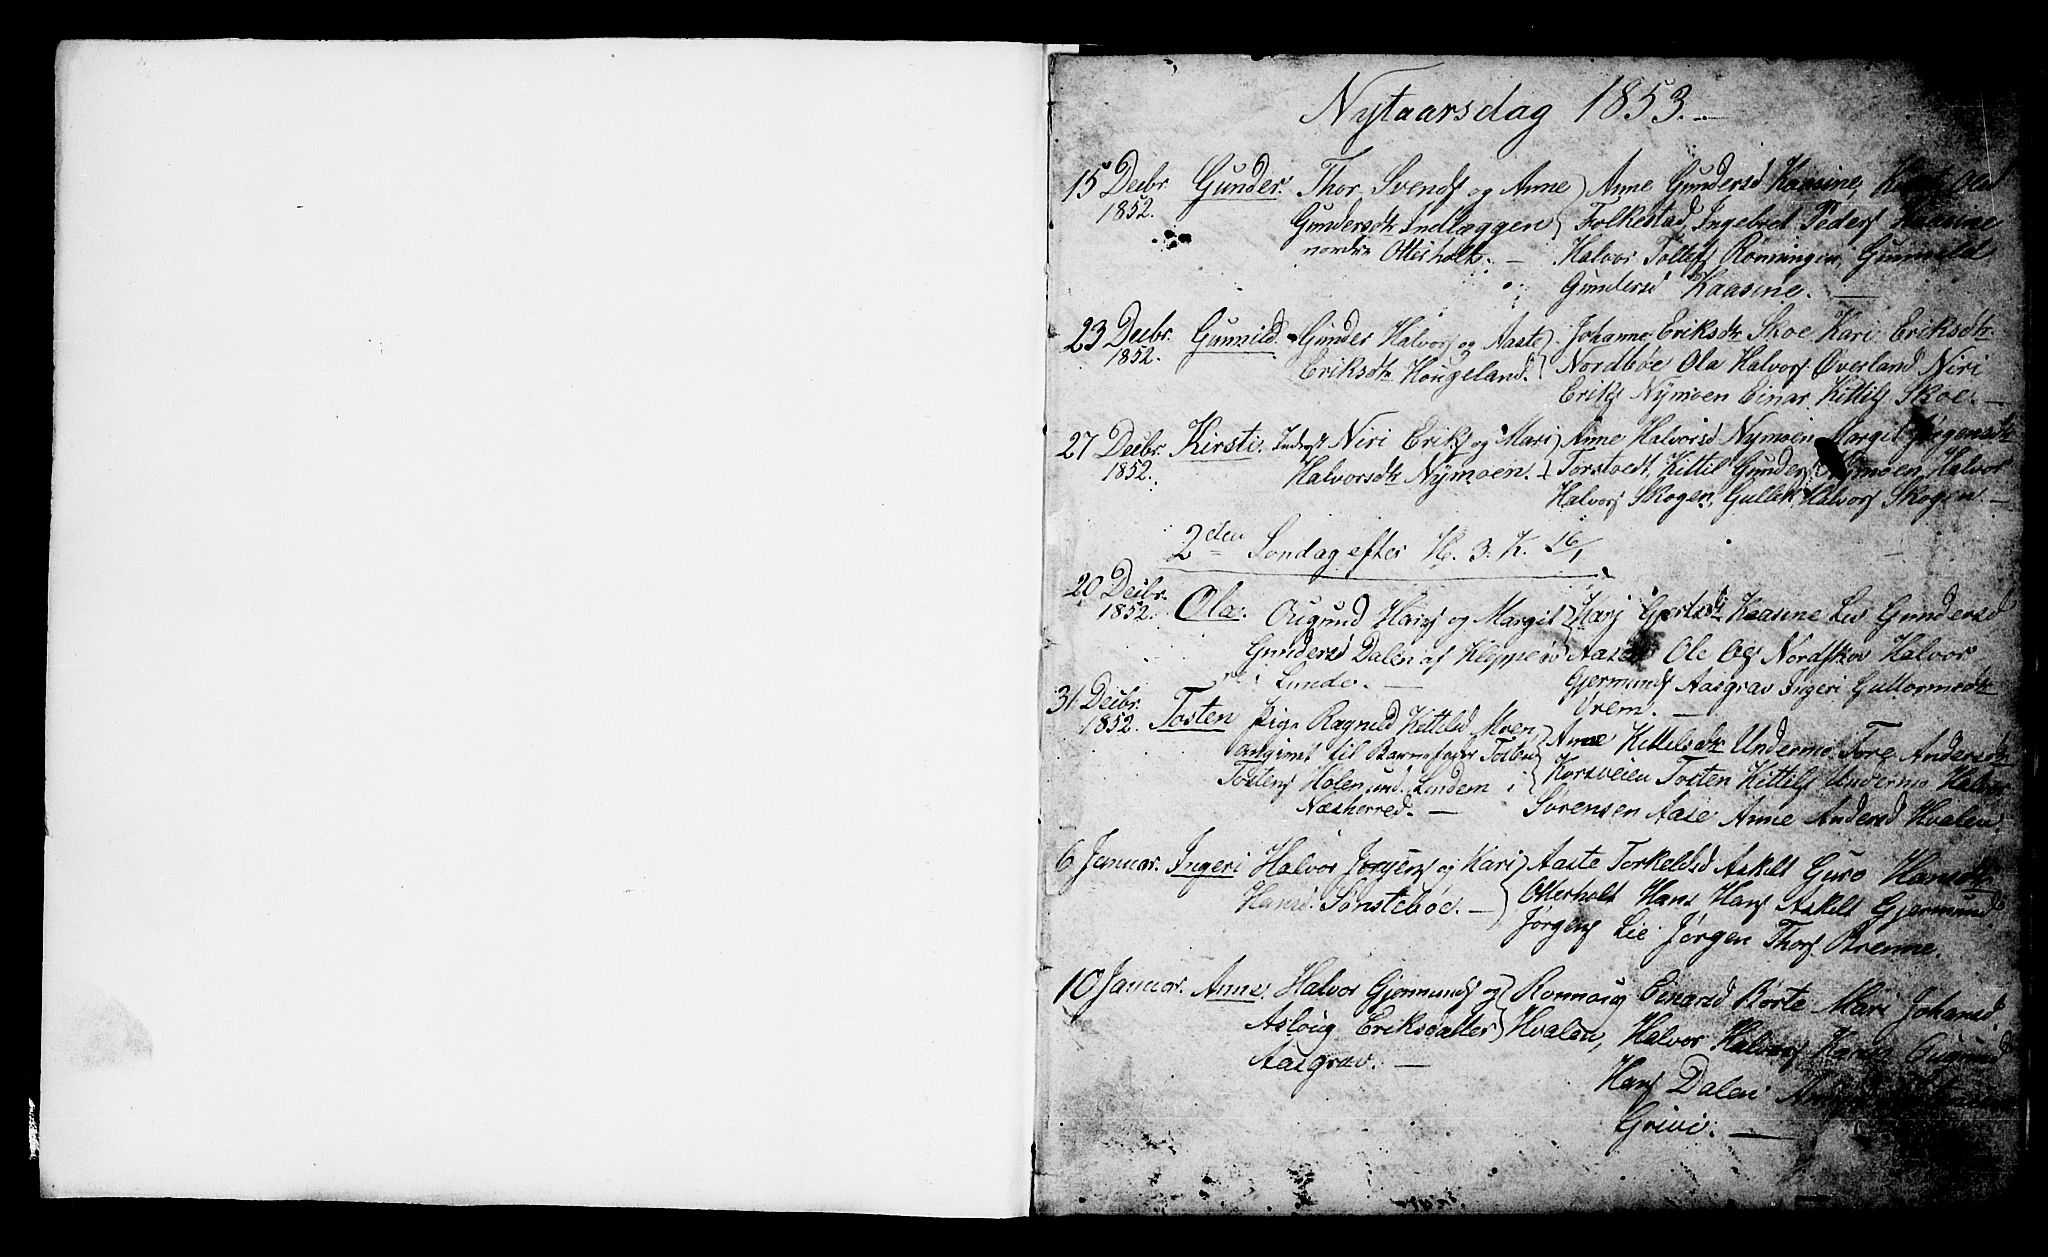 SAKO, Bø kirkebøker, G/Ga/L0002: Klokkerbok nr. 2, 1853-1866, s. 1